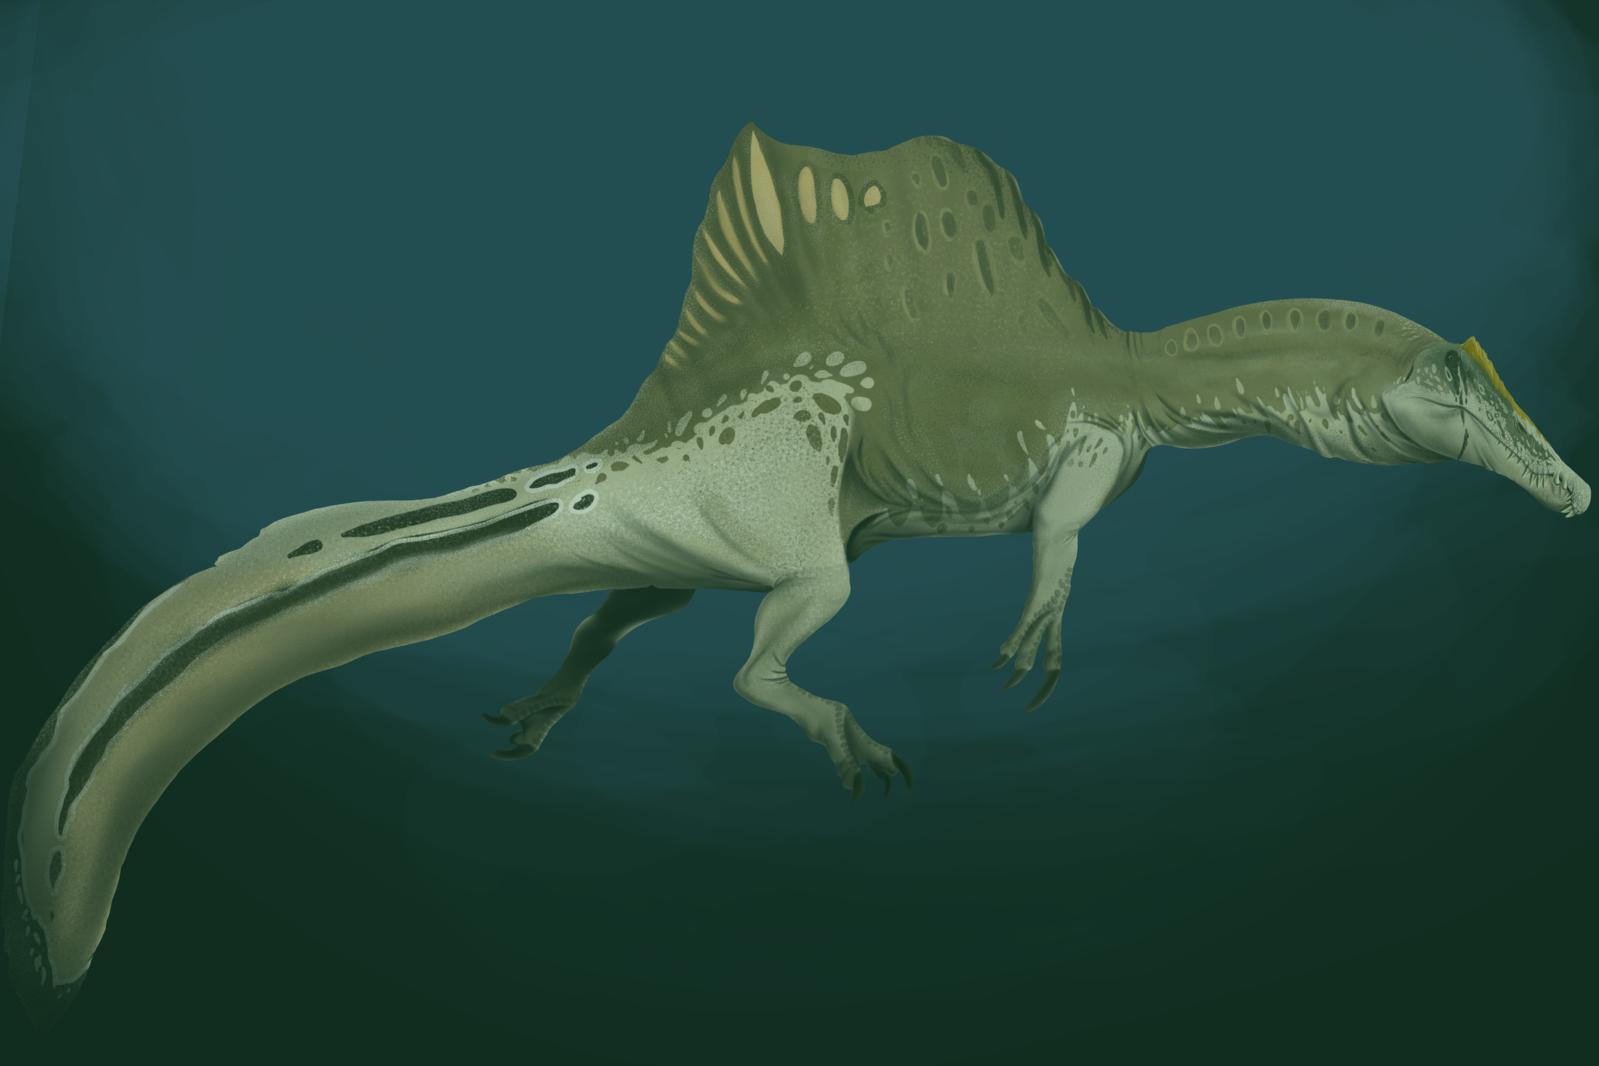 1599px-Spinosaurus_aegyptiacus_underwater.png